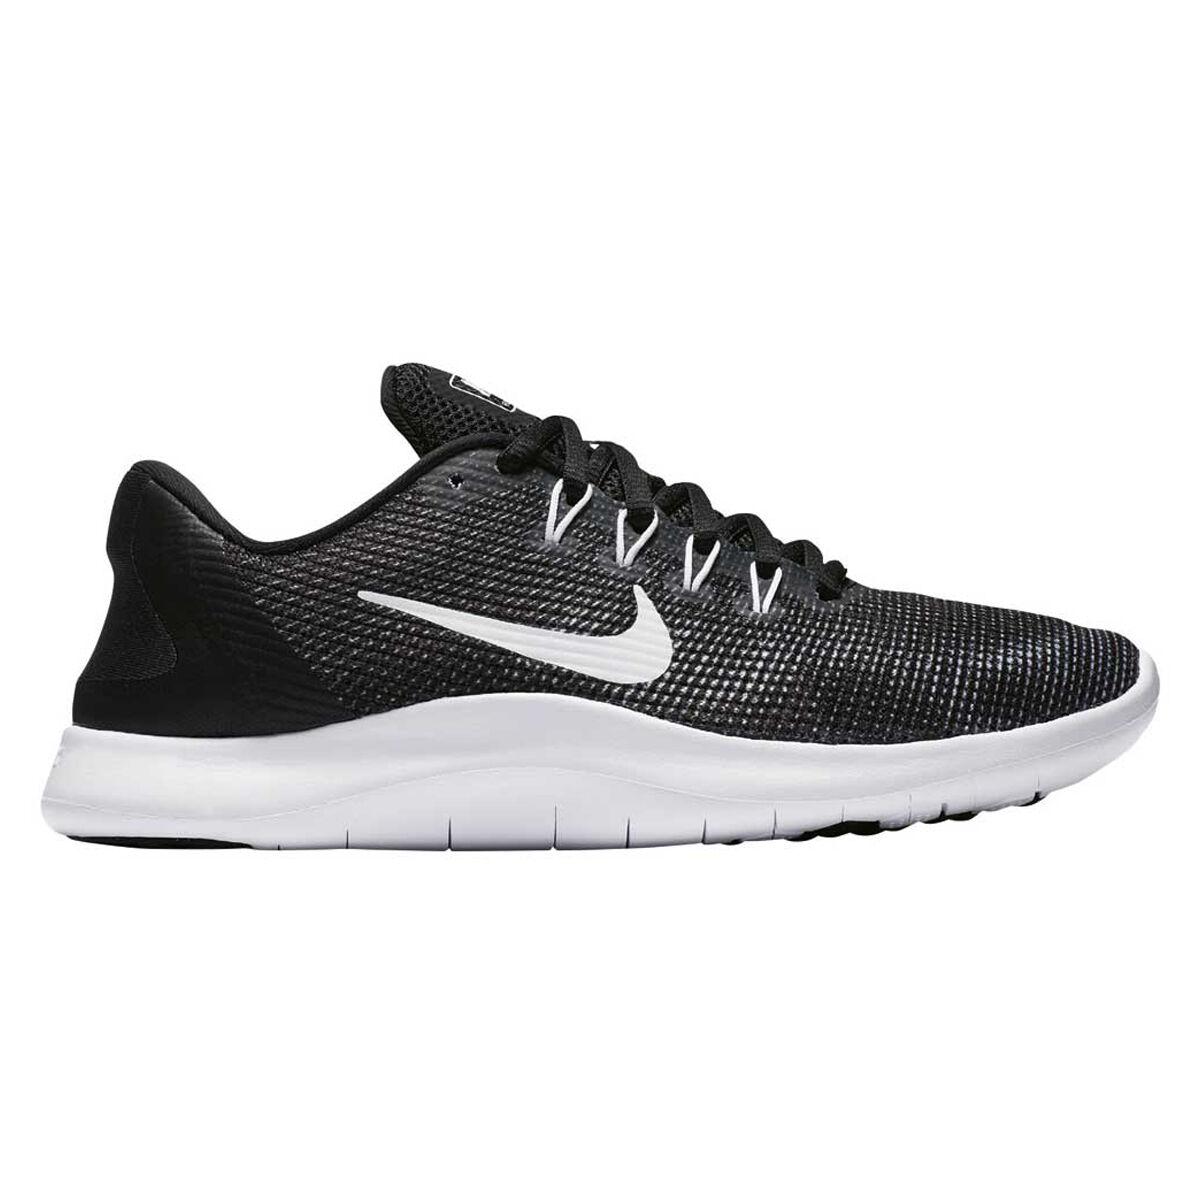 Nike Flex RN 2018 Womens Running Shoes Black White US 7.5